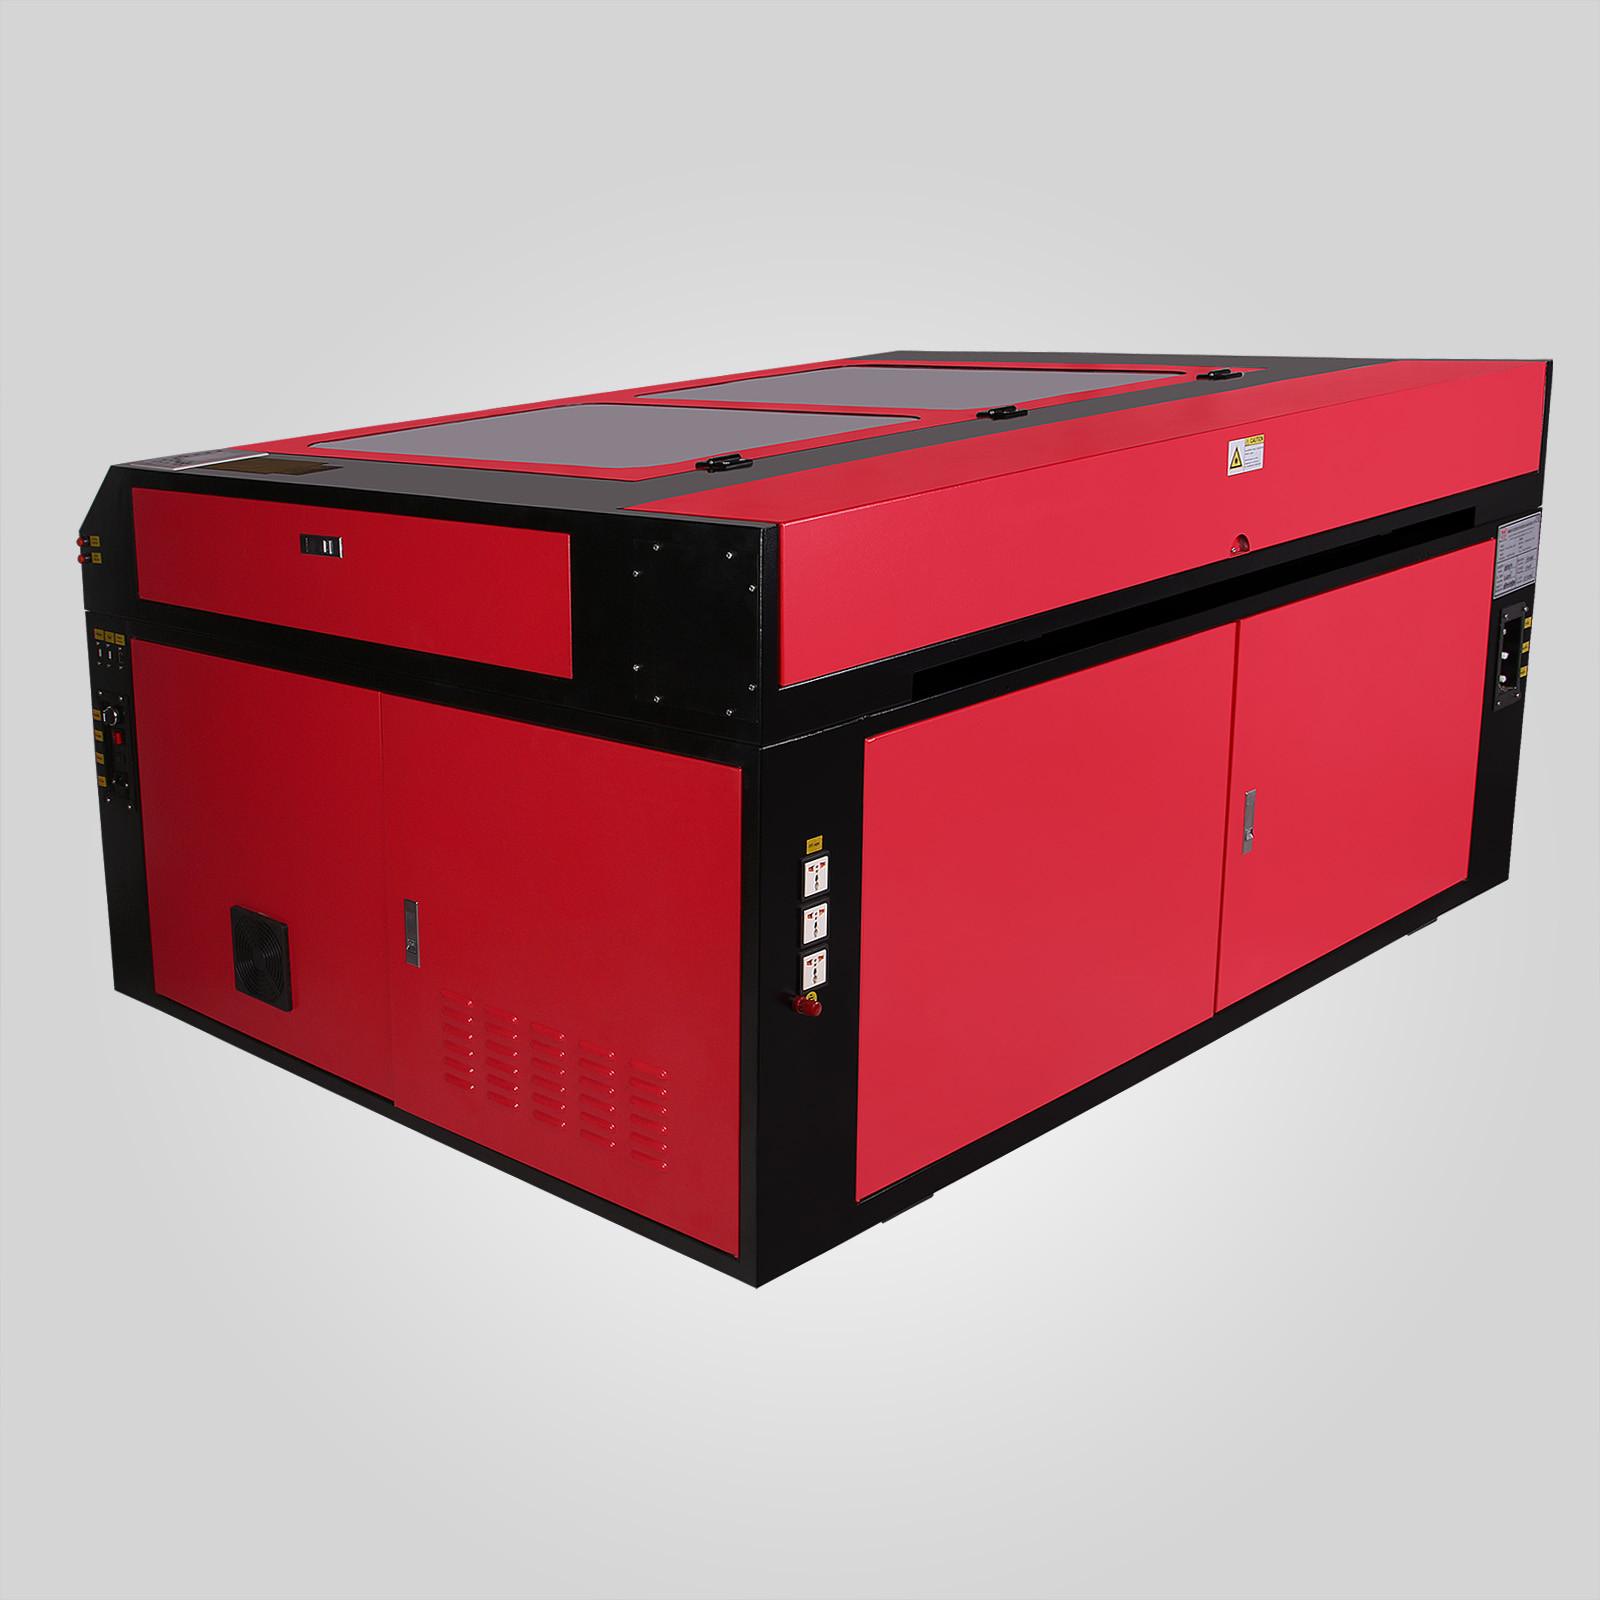 Macchina-per-Incisione-Laser-CO2-40-130W-Asse-Rotante-Tagliatrice-Incisore miniatura 77